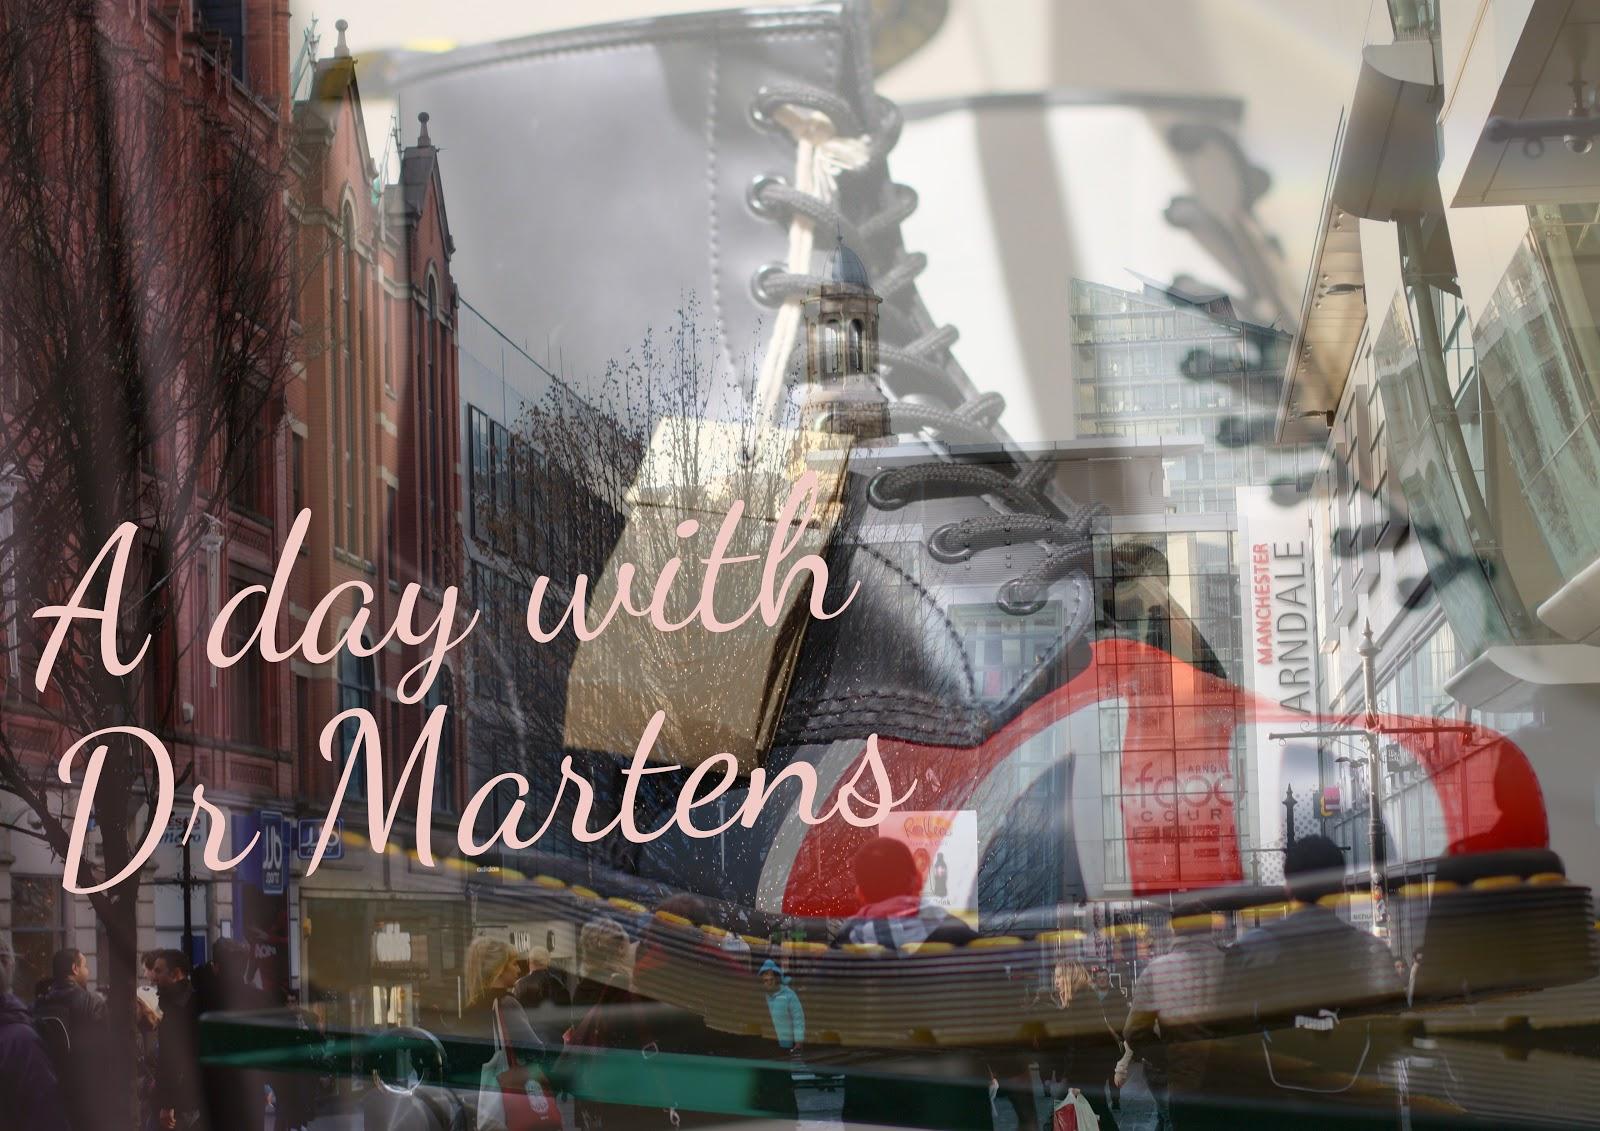 Manchester City Guide - Blog Mode - Voyage avec Dr Martens